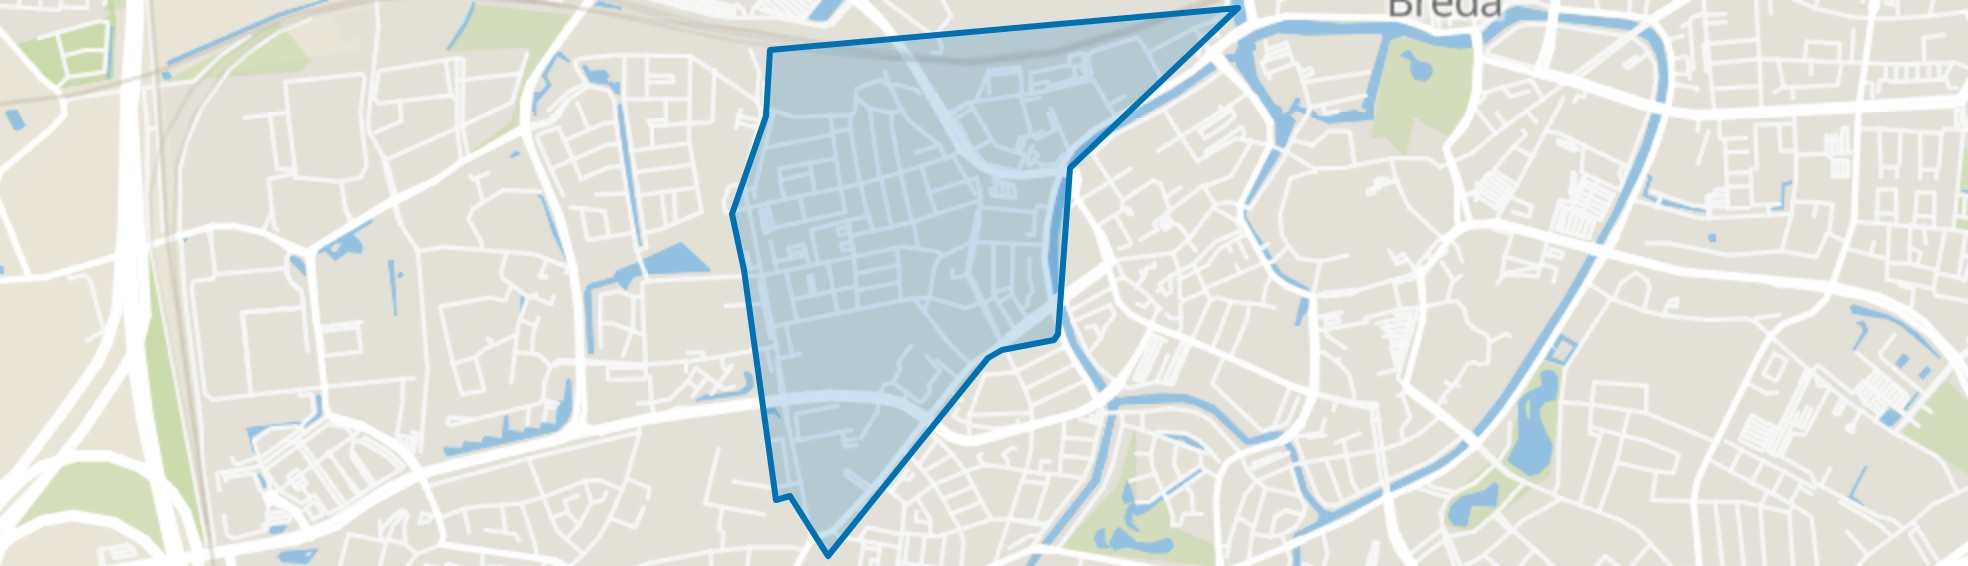 Tuinzigt, Breda map